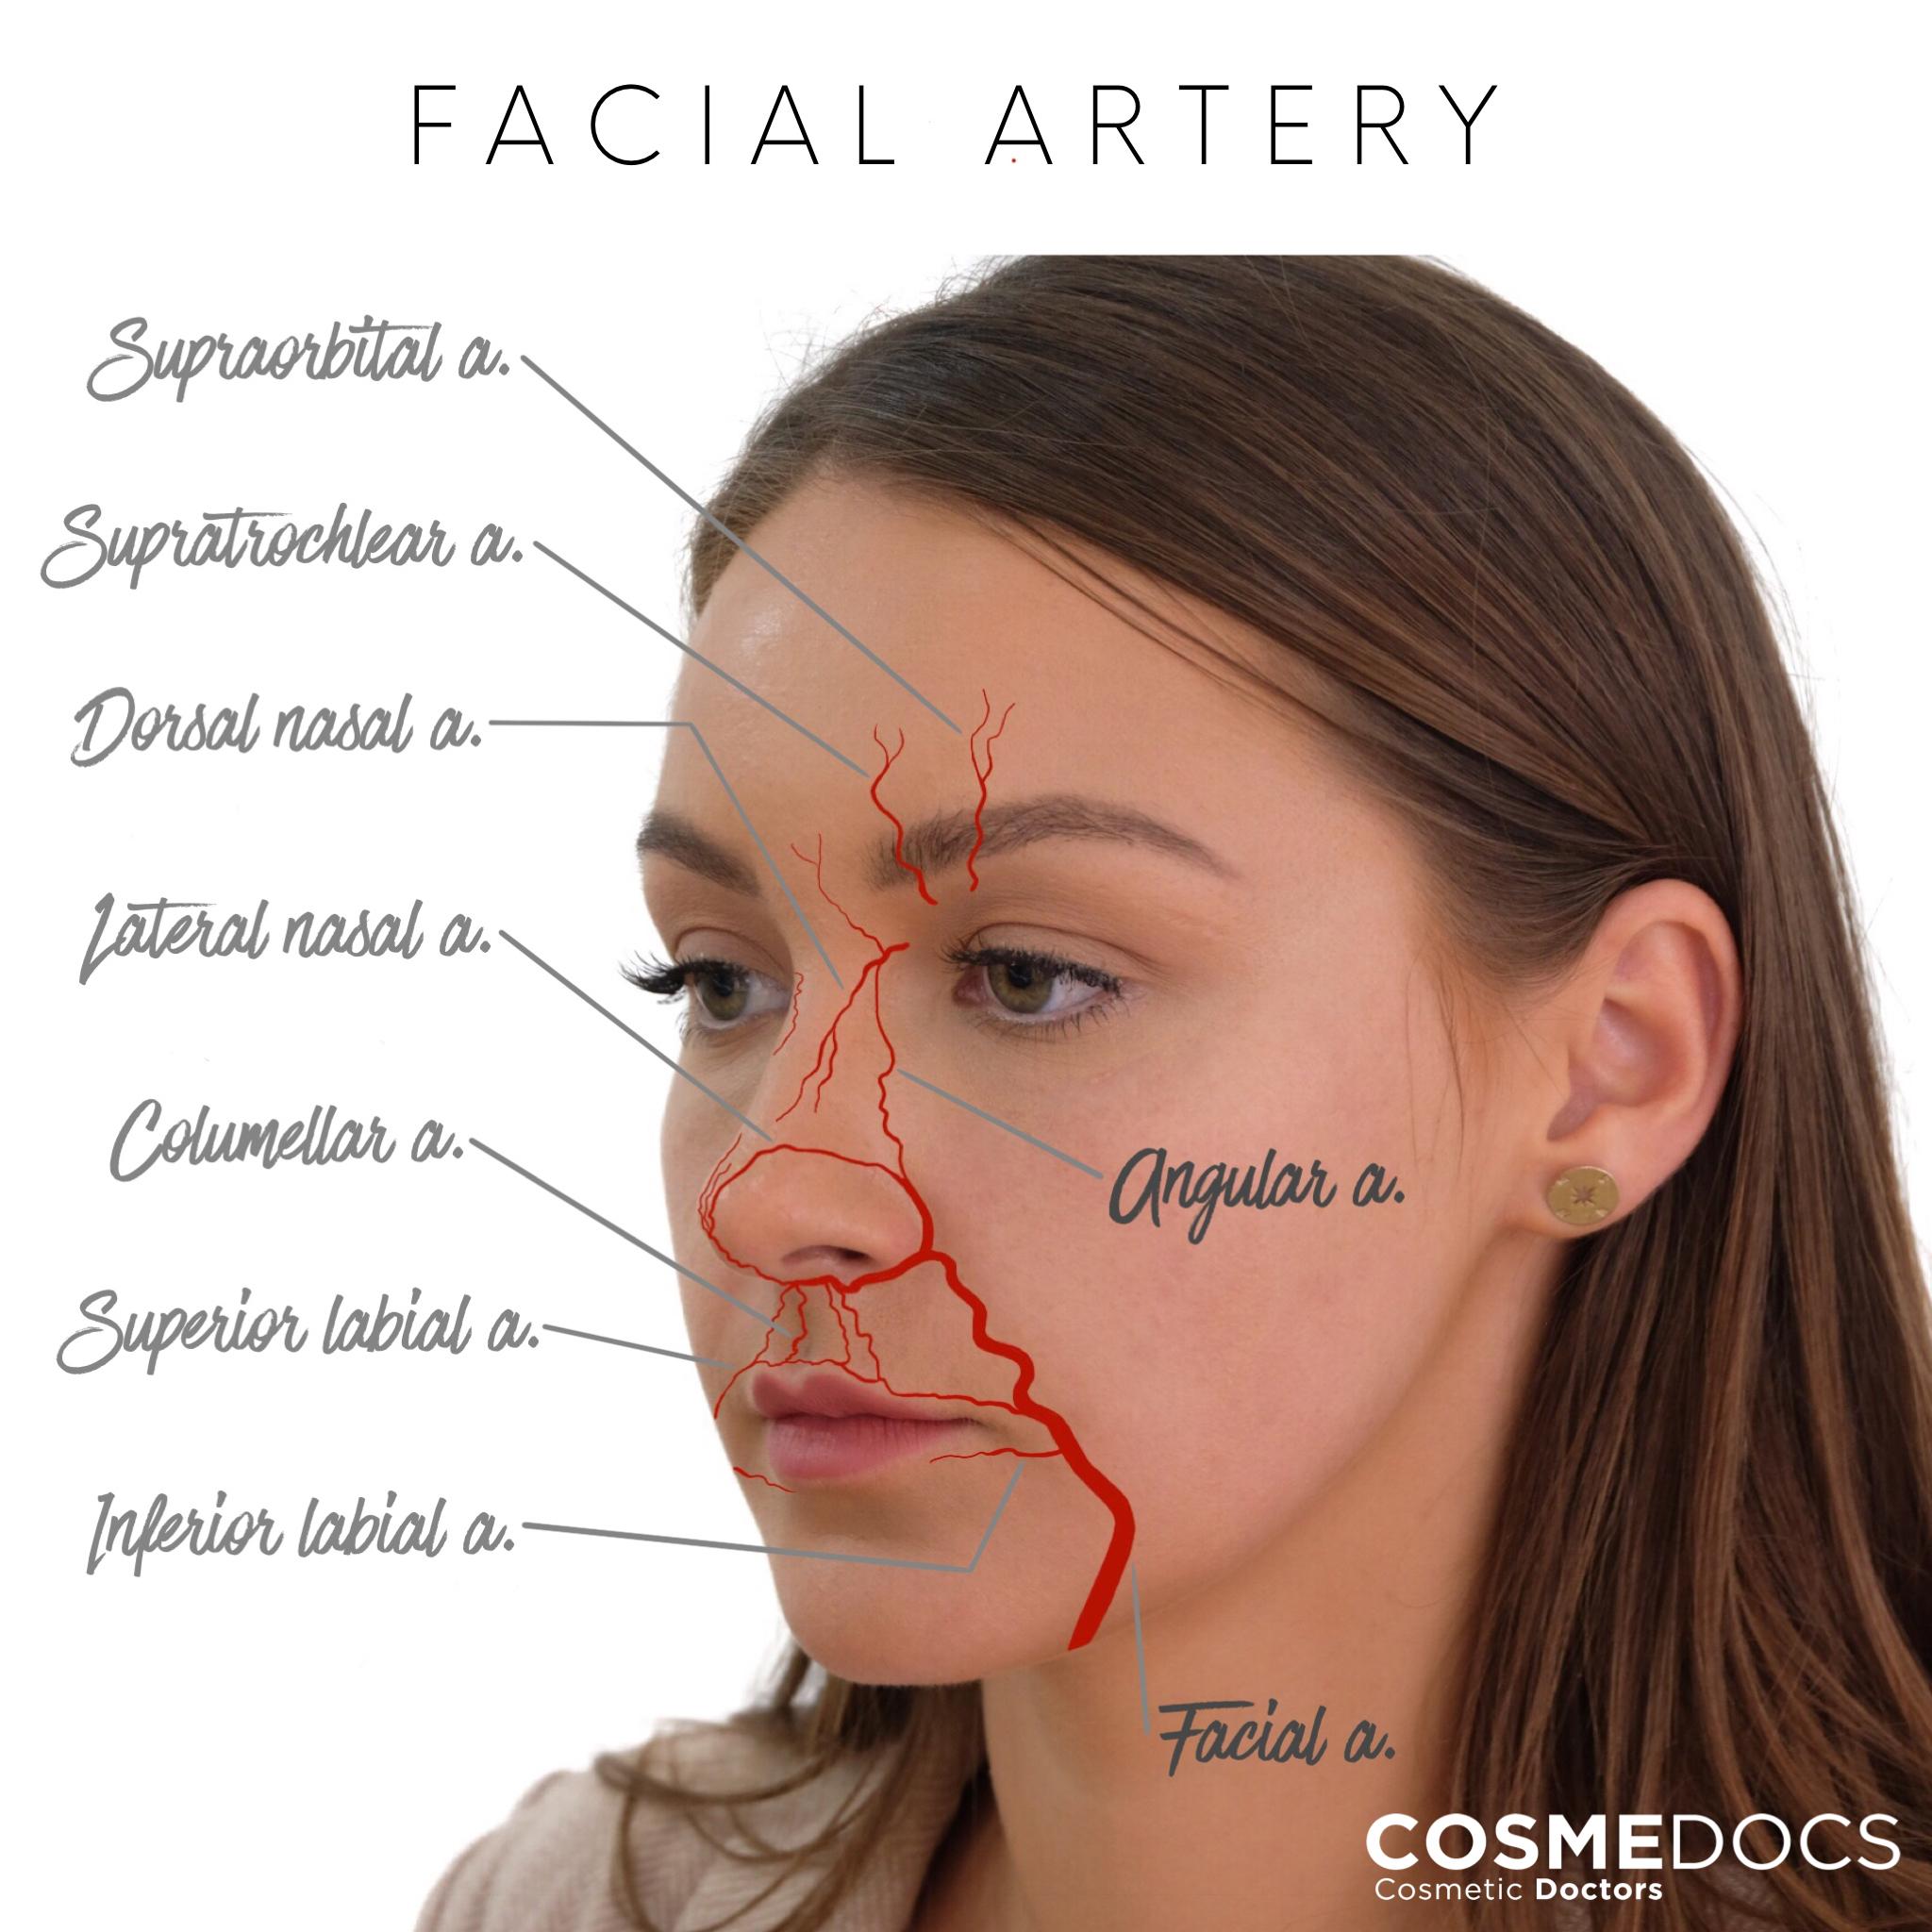 facial artery illustration